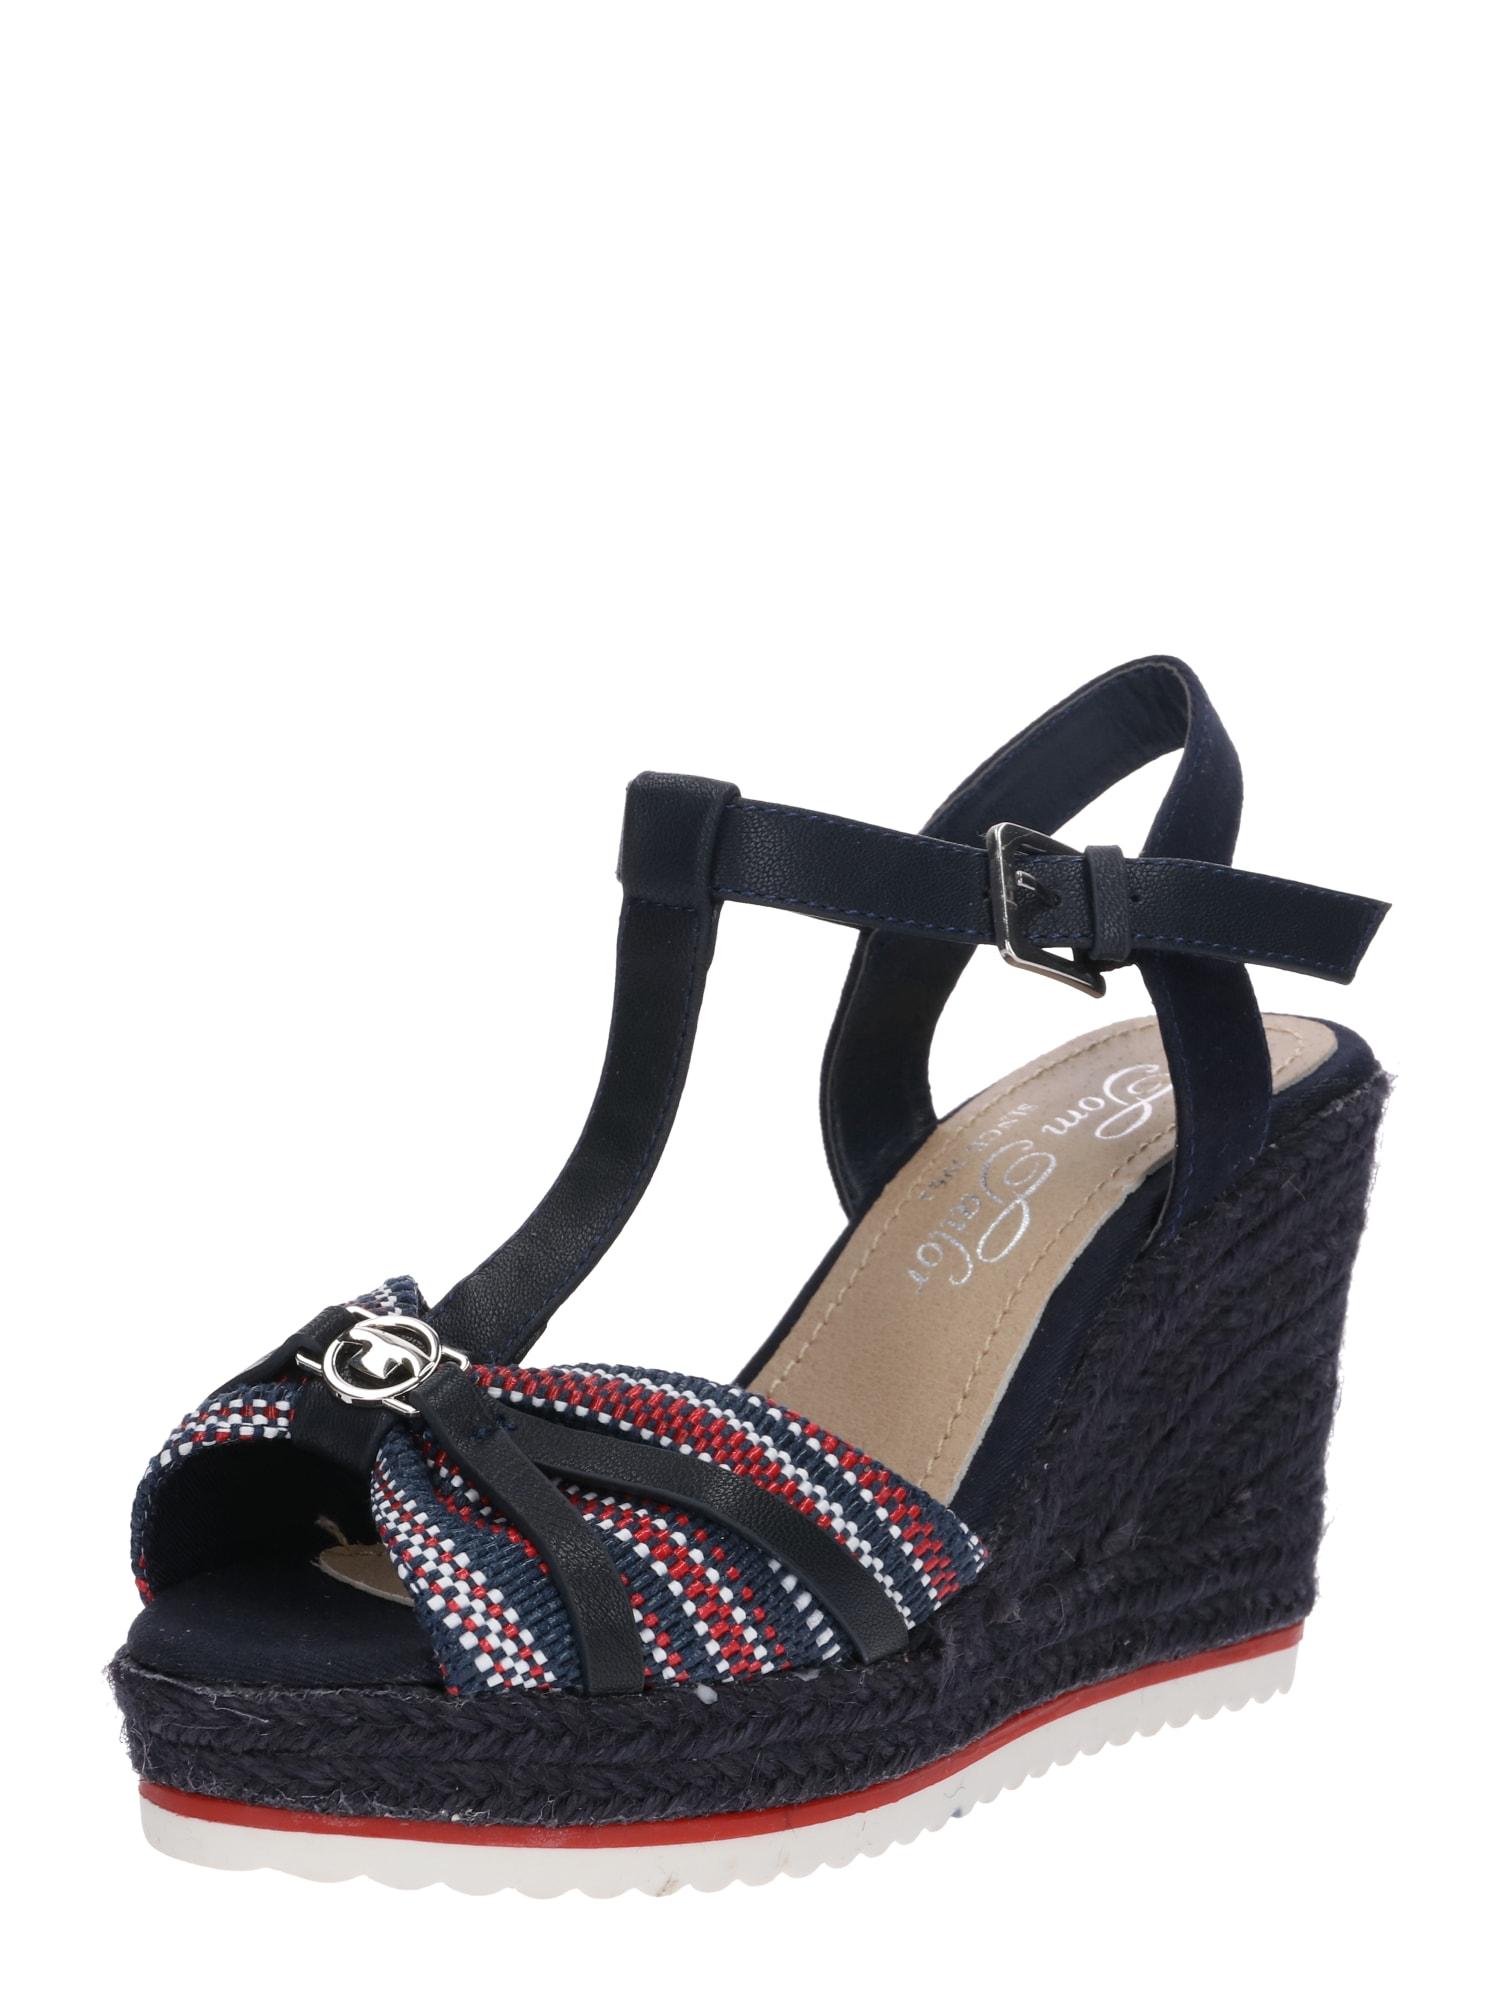 newest collection eb621 61cda AboutYou | SALE Damen TOM TAILOR Sandale beige, blau, blau ...